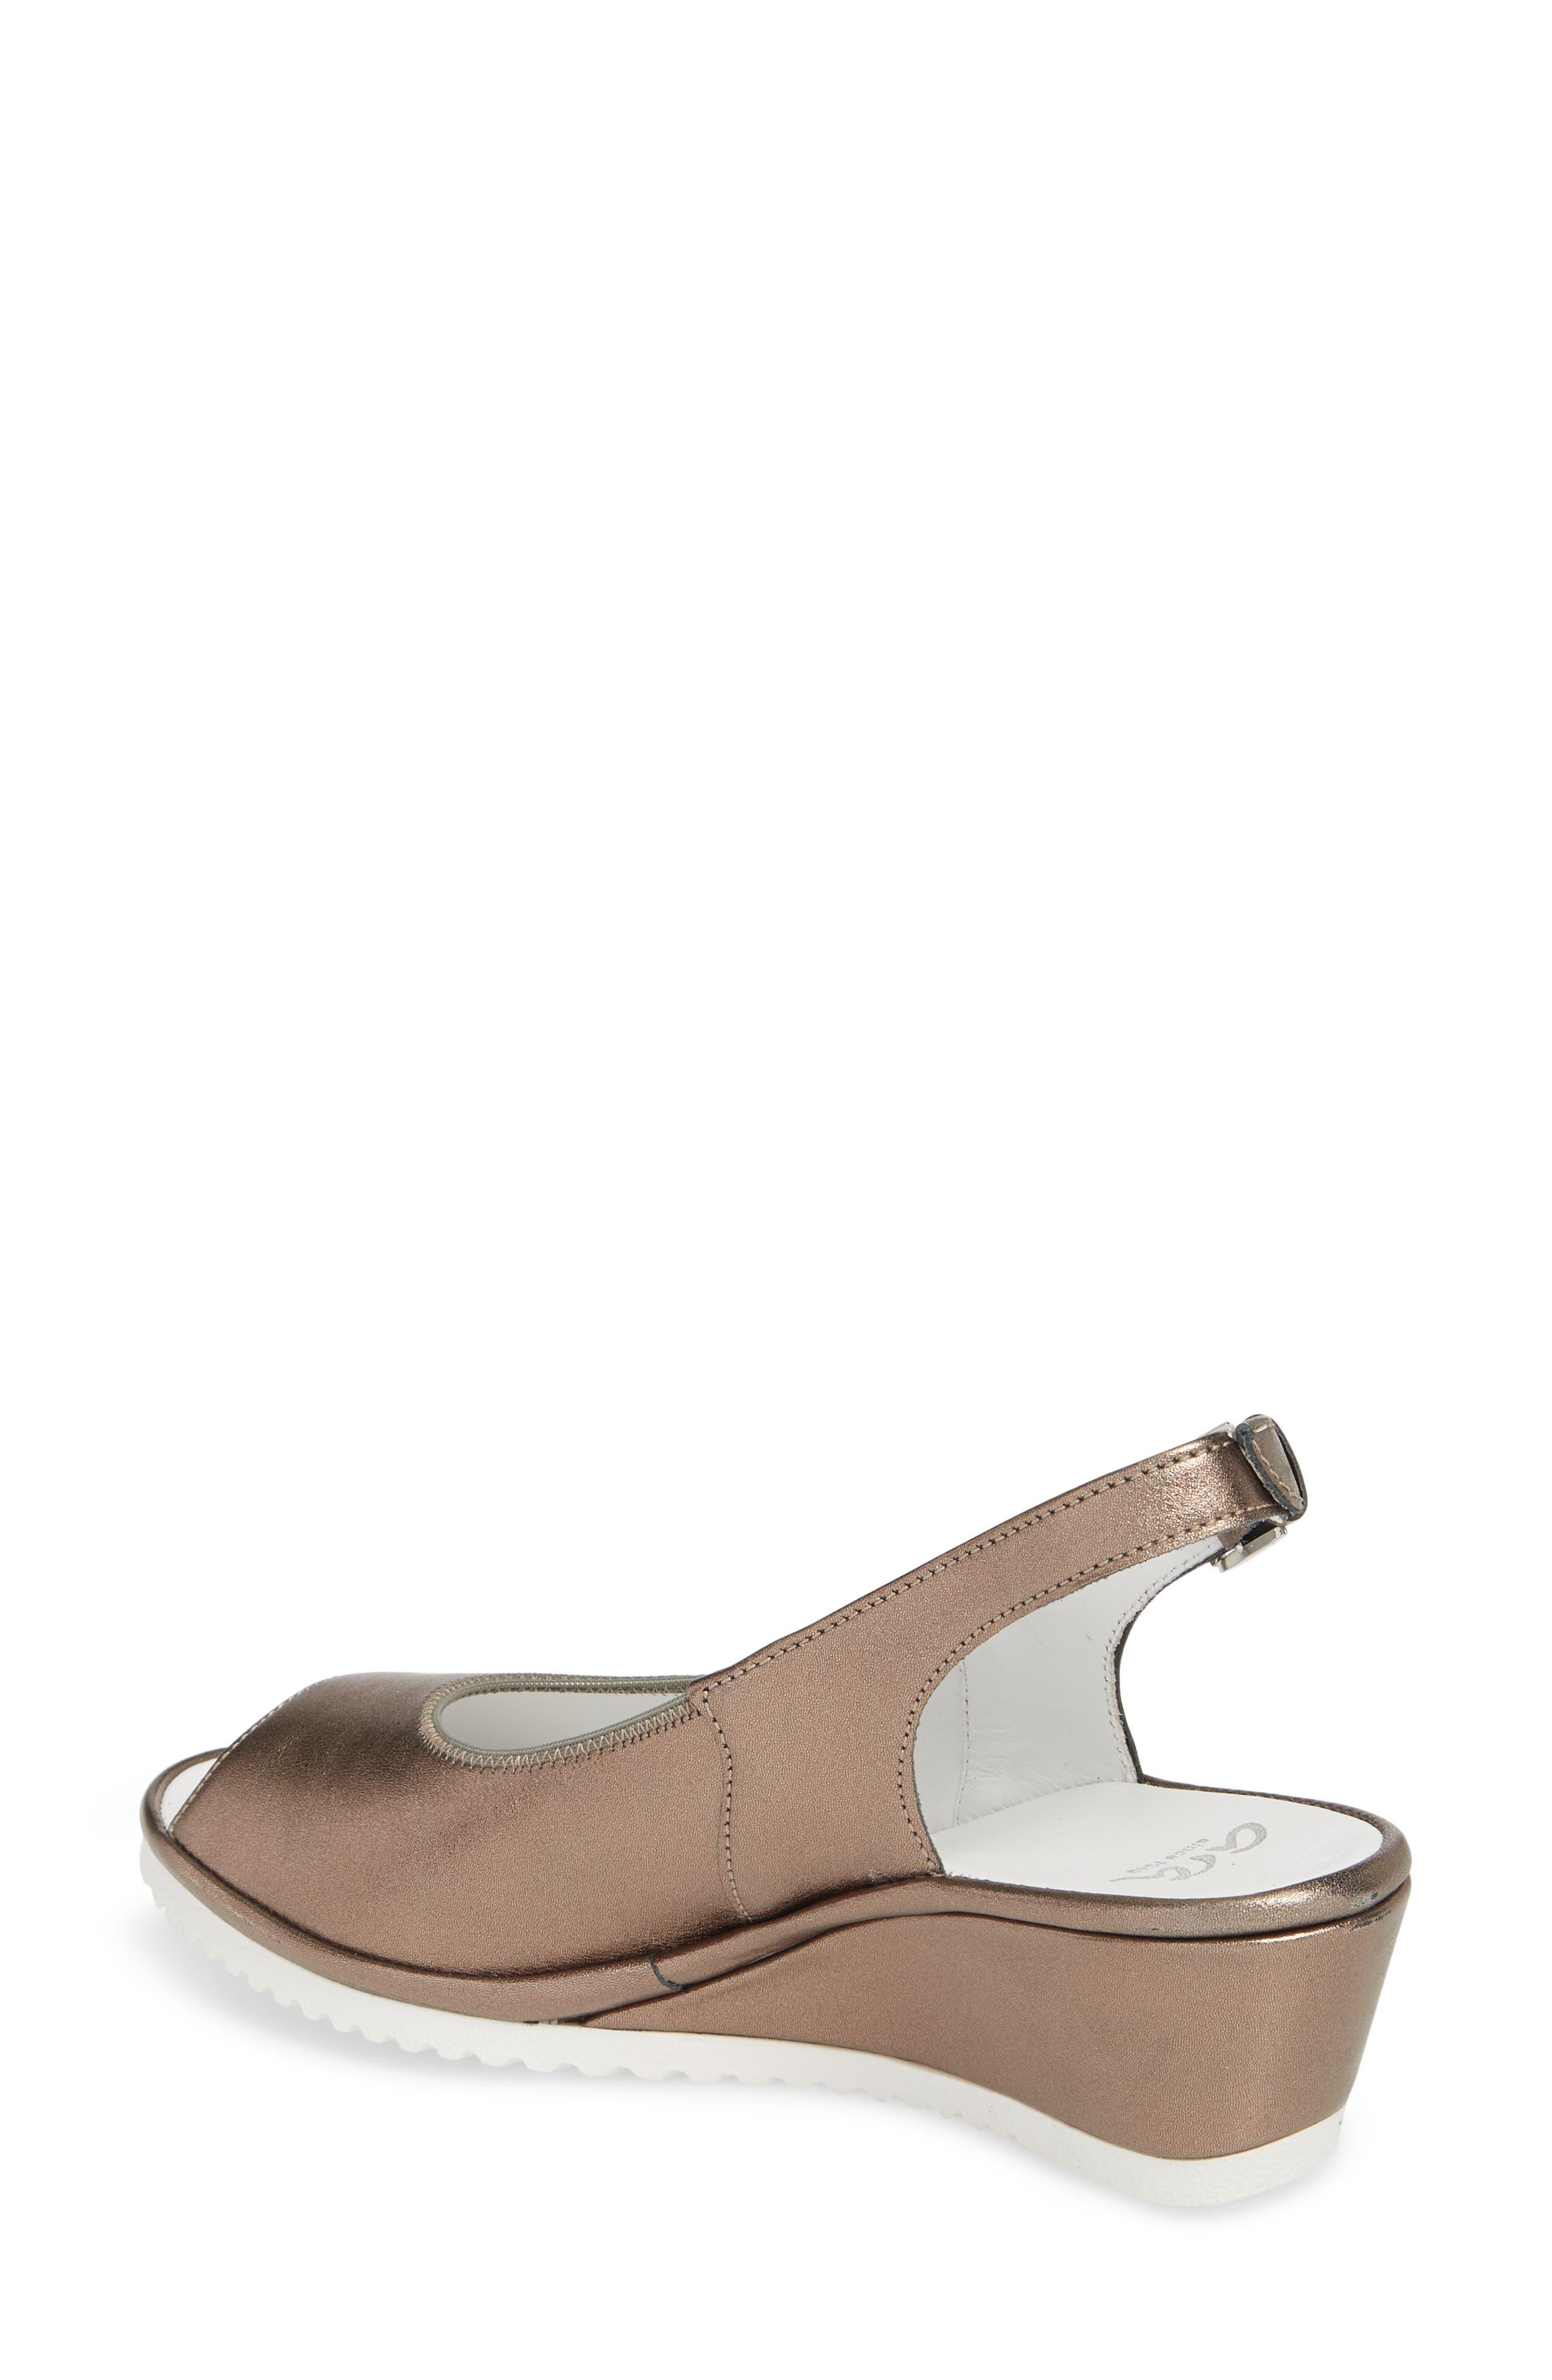 addfb377998 Women's Ara Shoes   Nordstrom